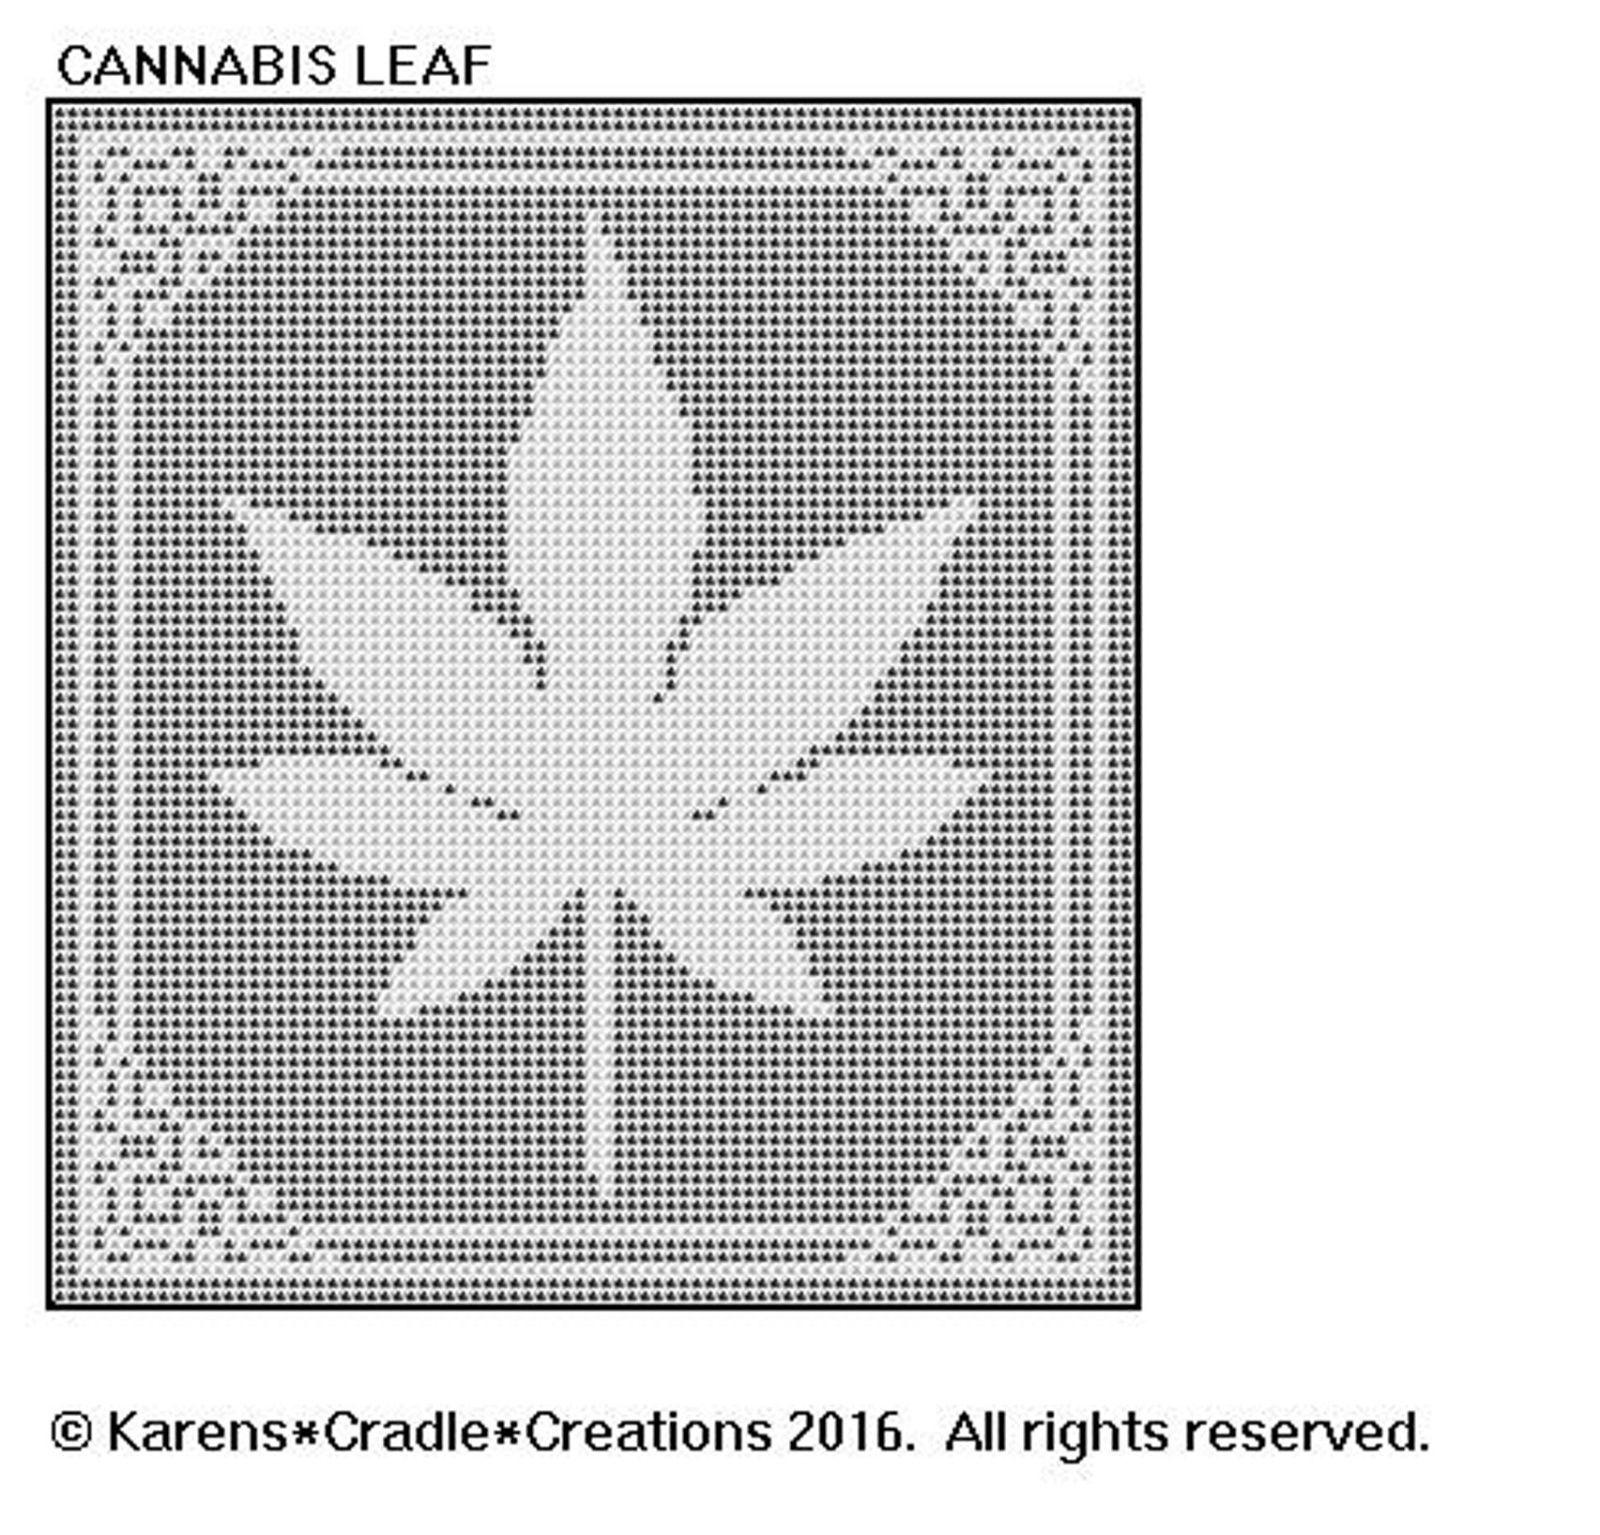 Cannabis Leaf - Filet Crochet Pattern | eBay